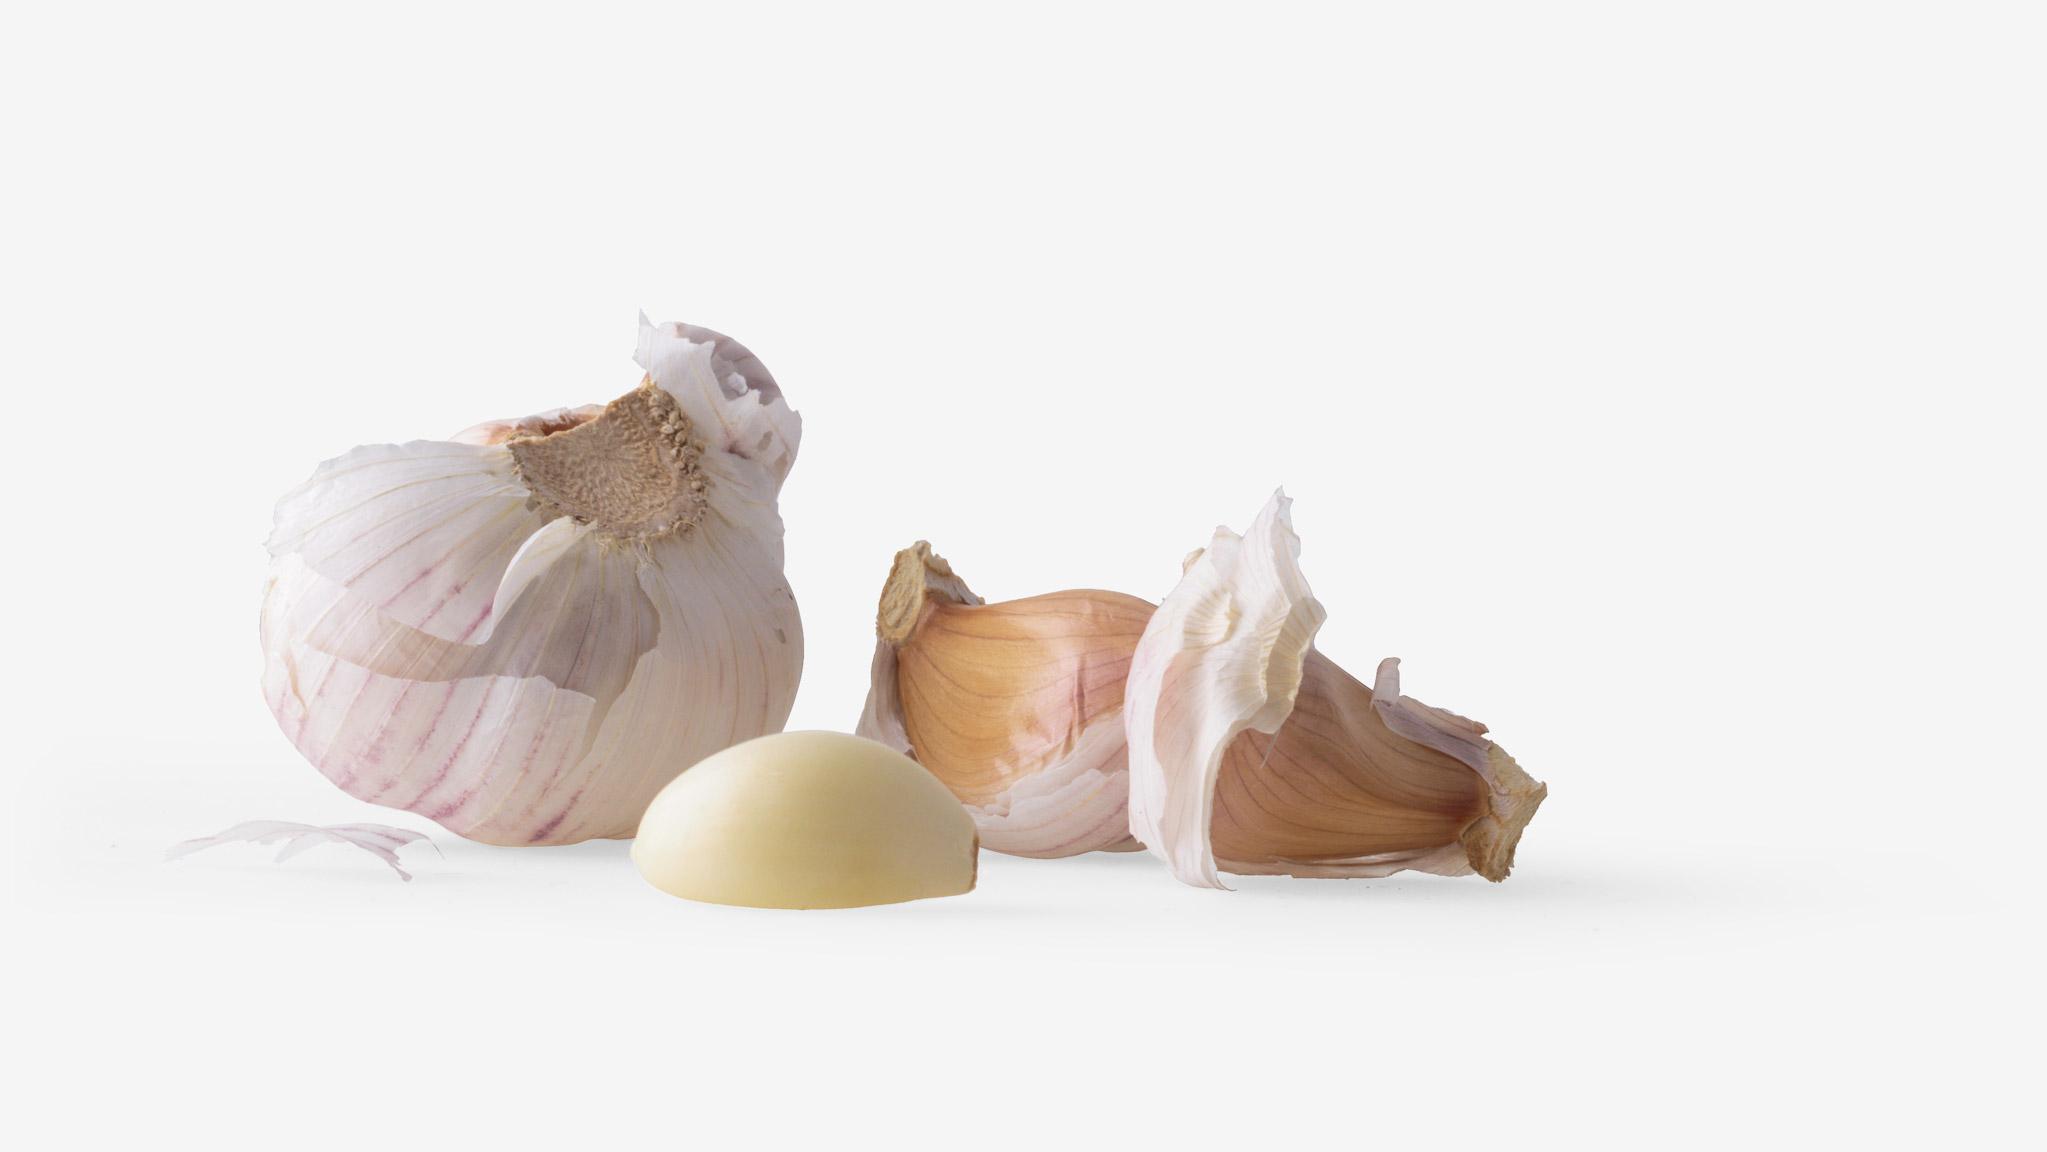 Garlic PSD isolated image